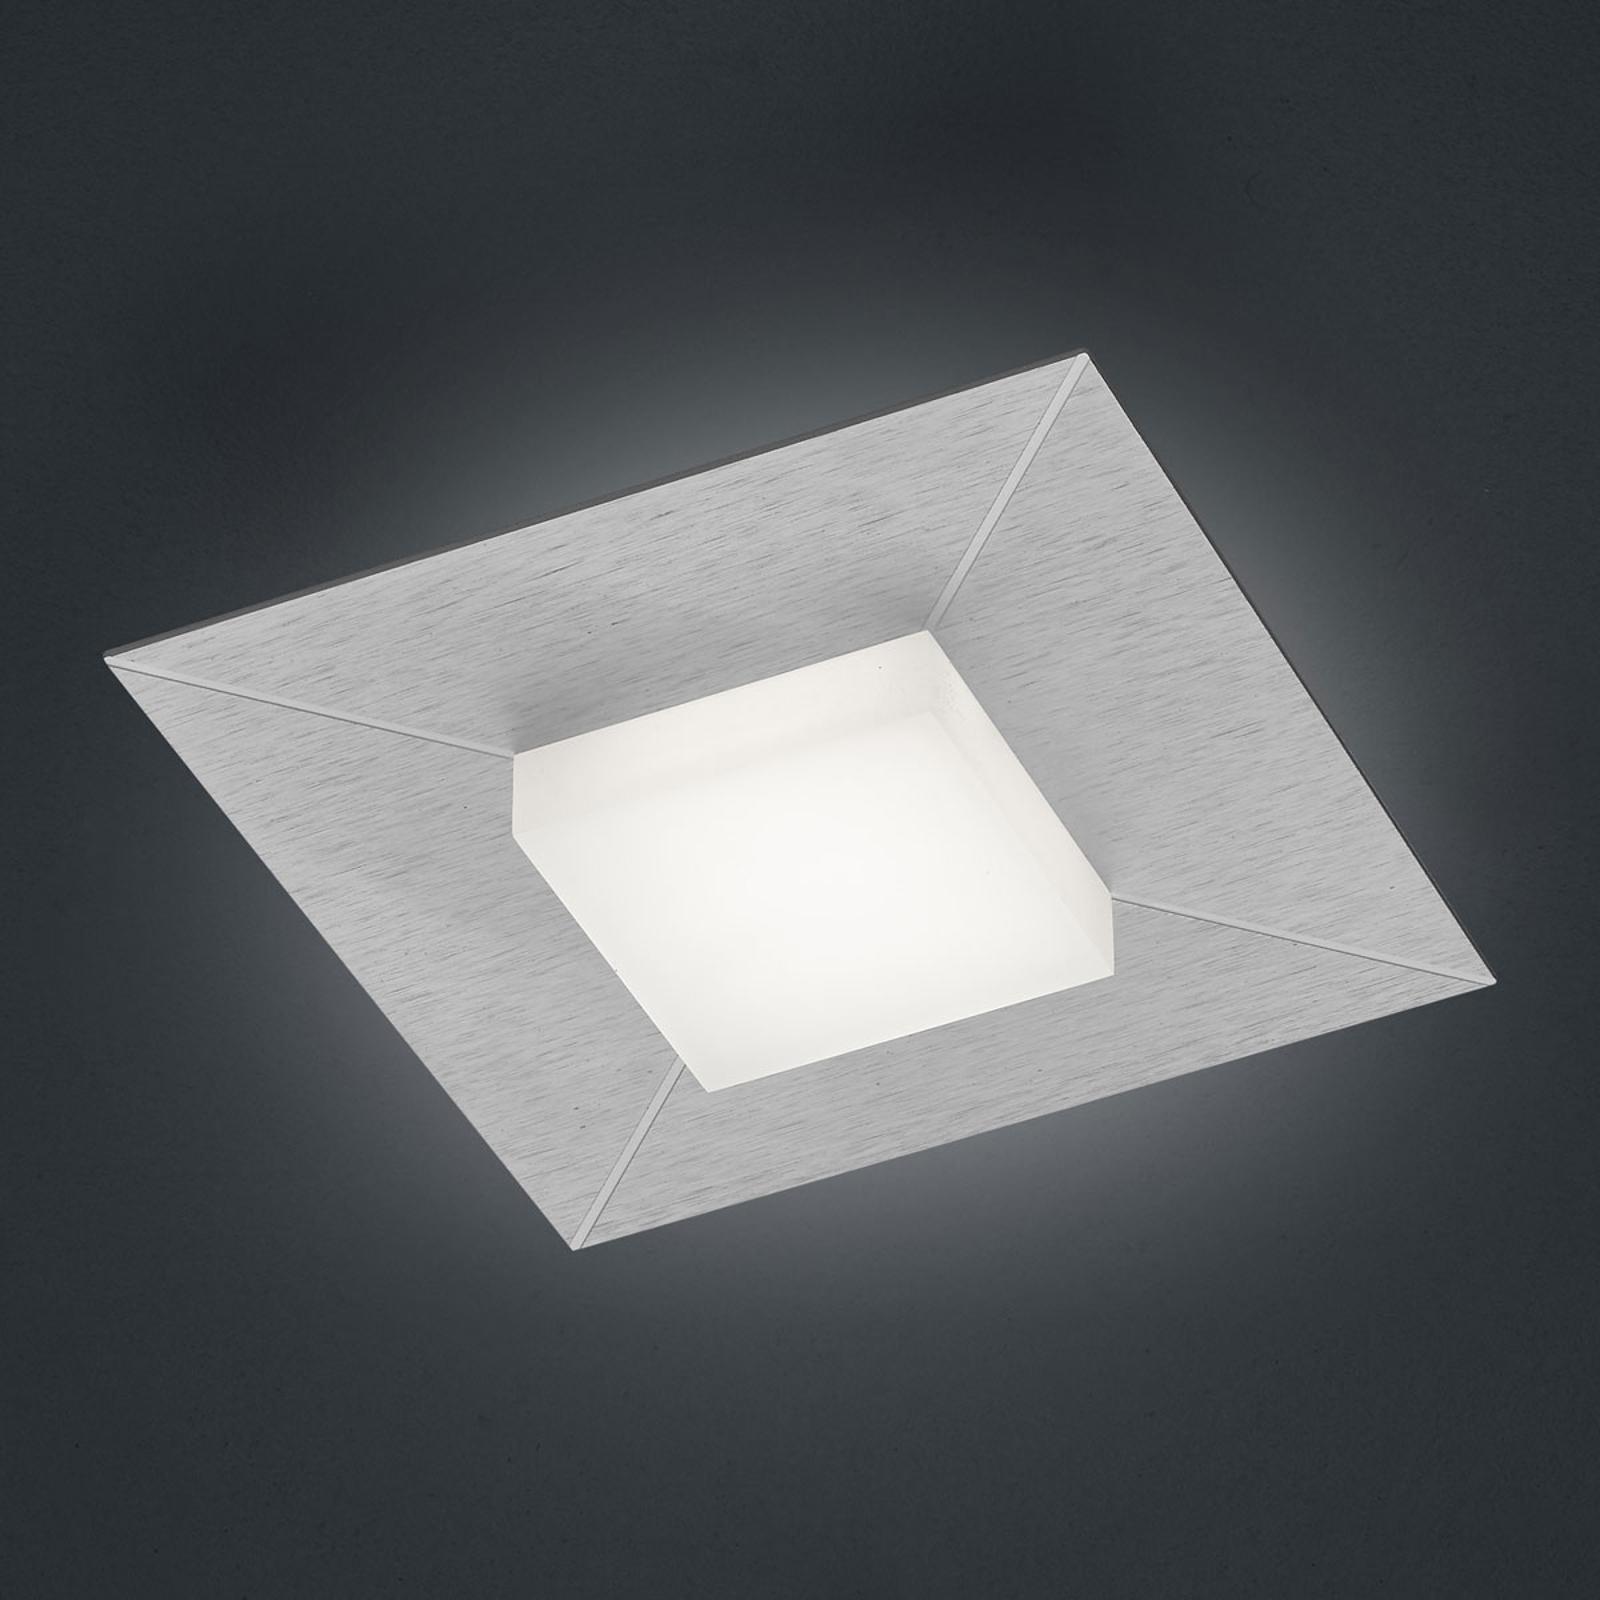 BANKAMP Diamond lampa sufitowa 17x17cm, srebrna